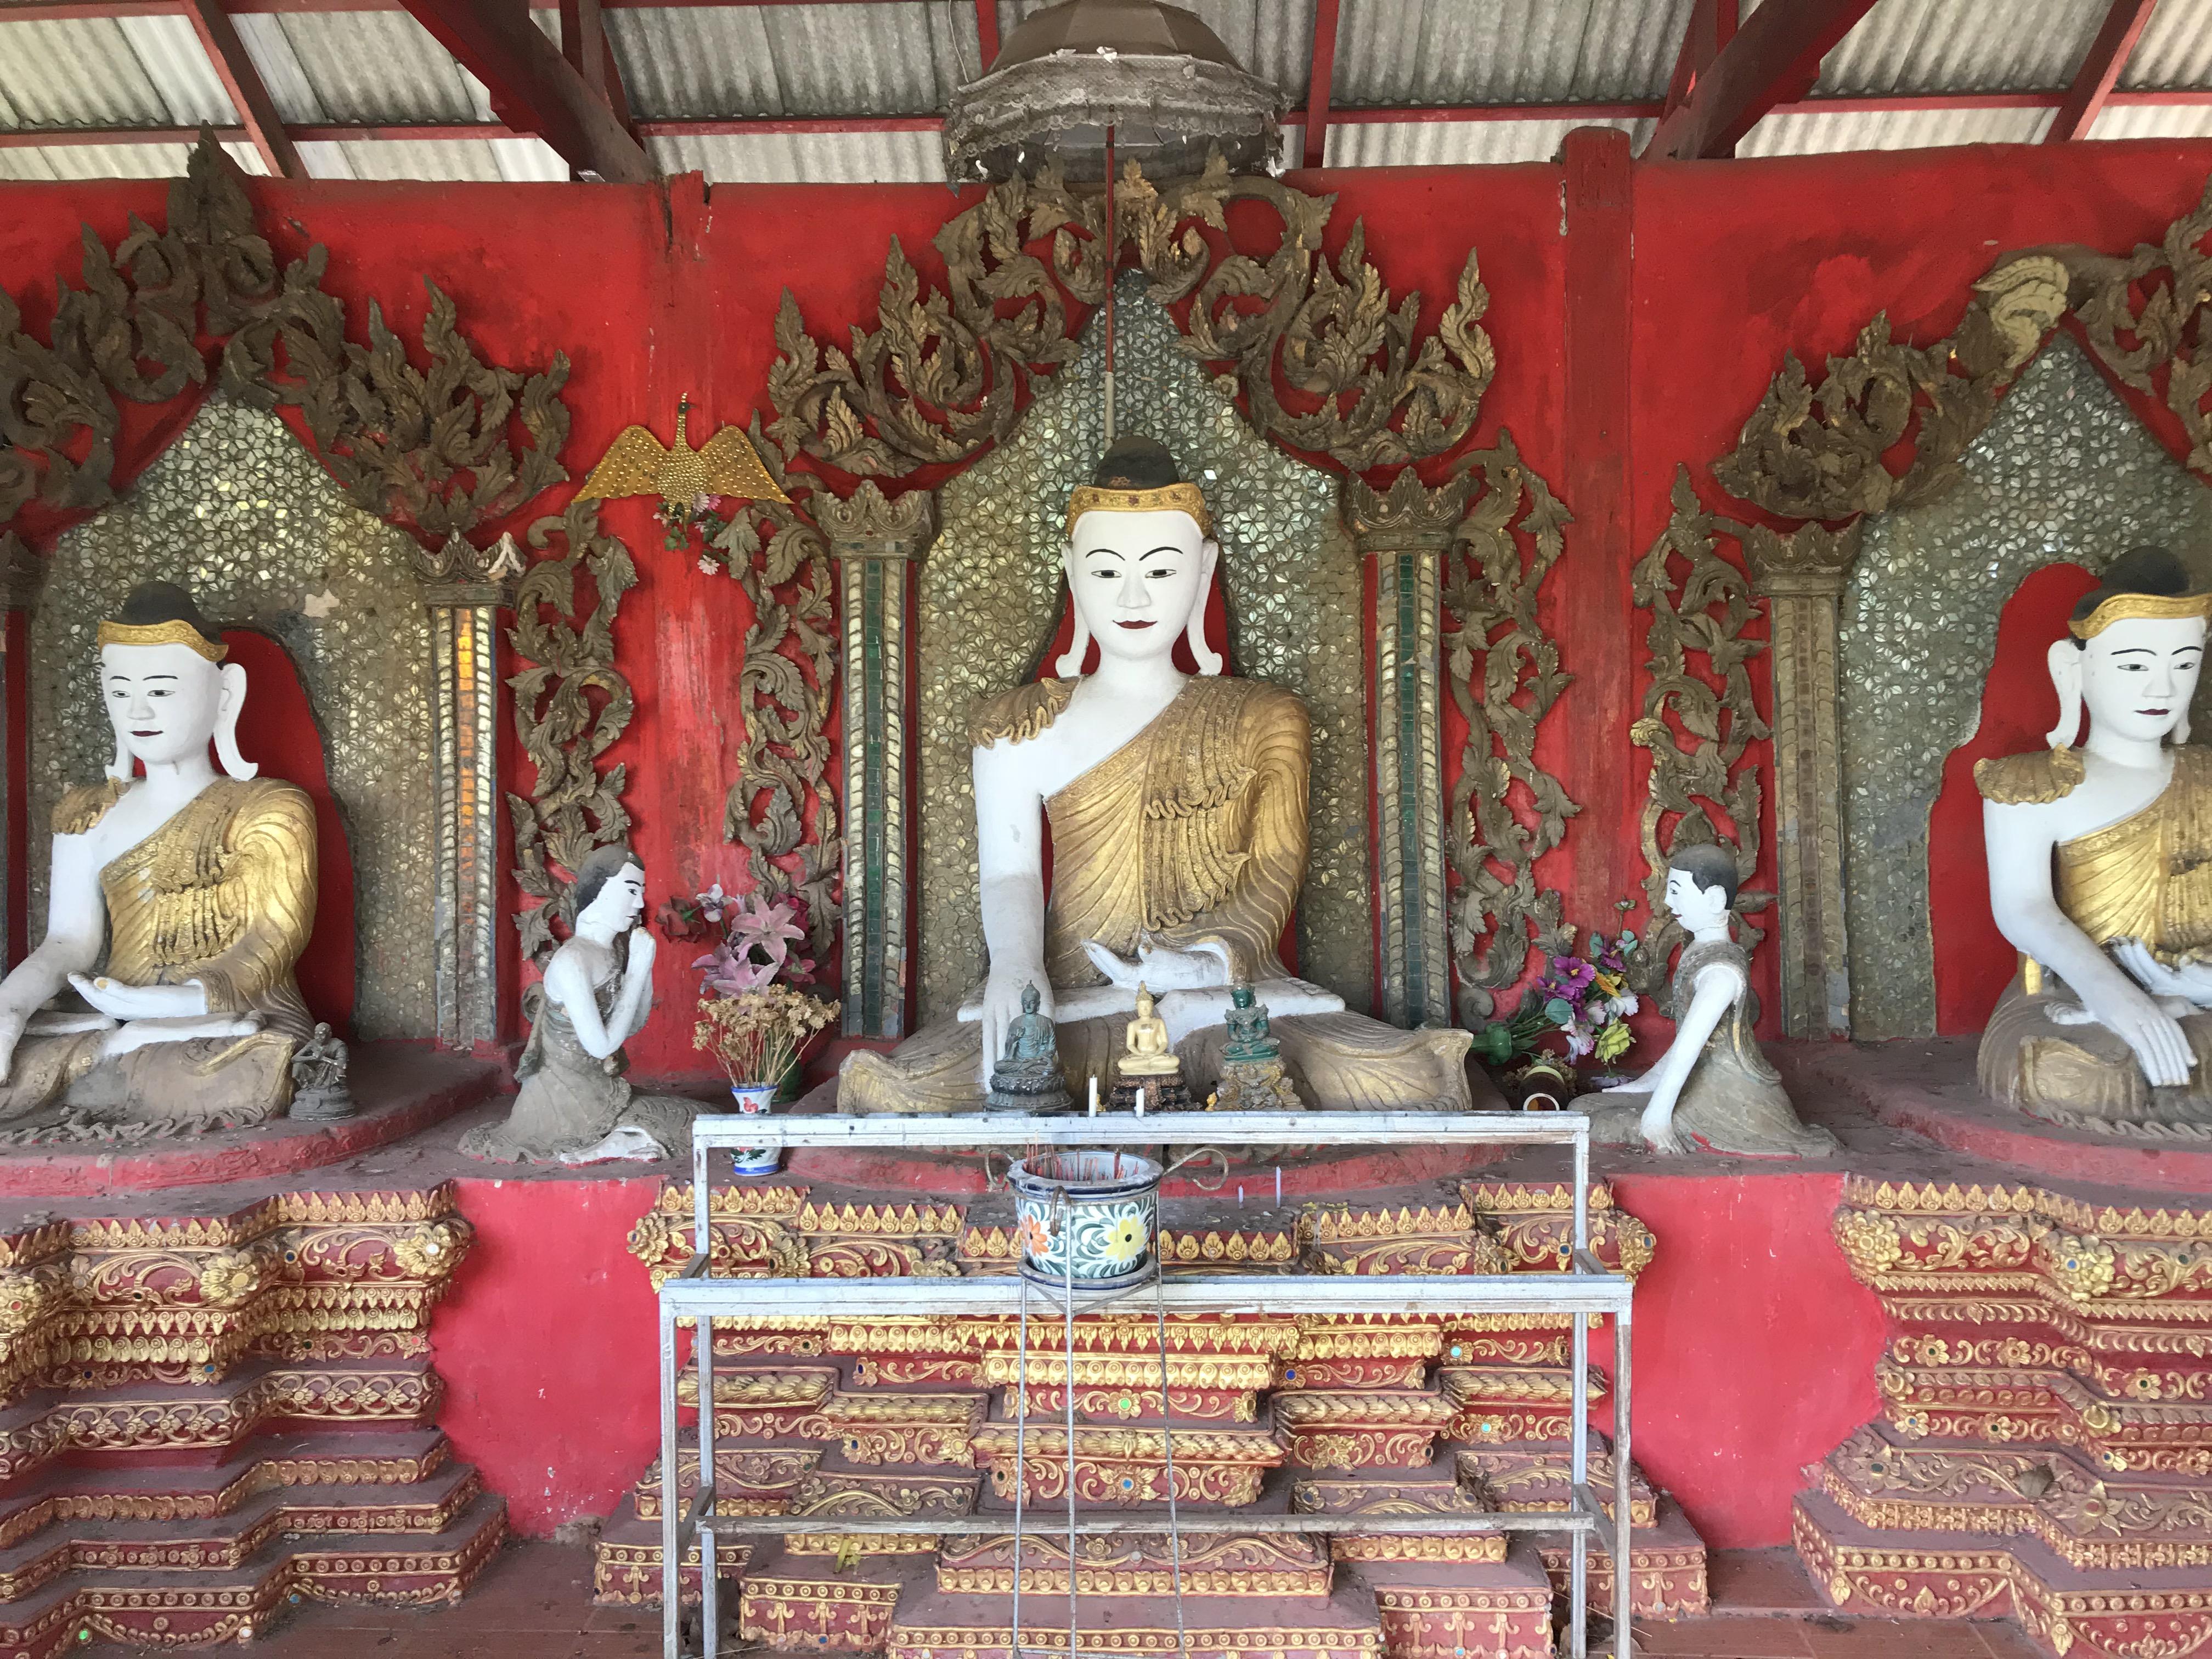 メーホーソン 仏教寺院